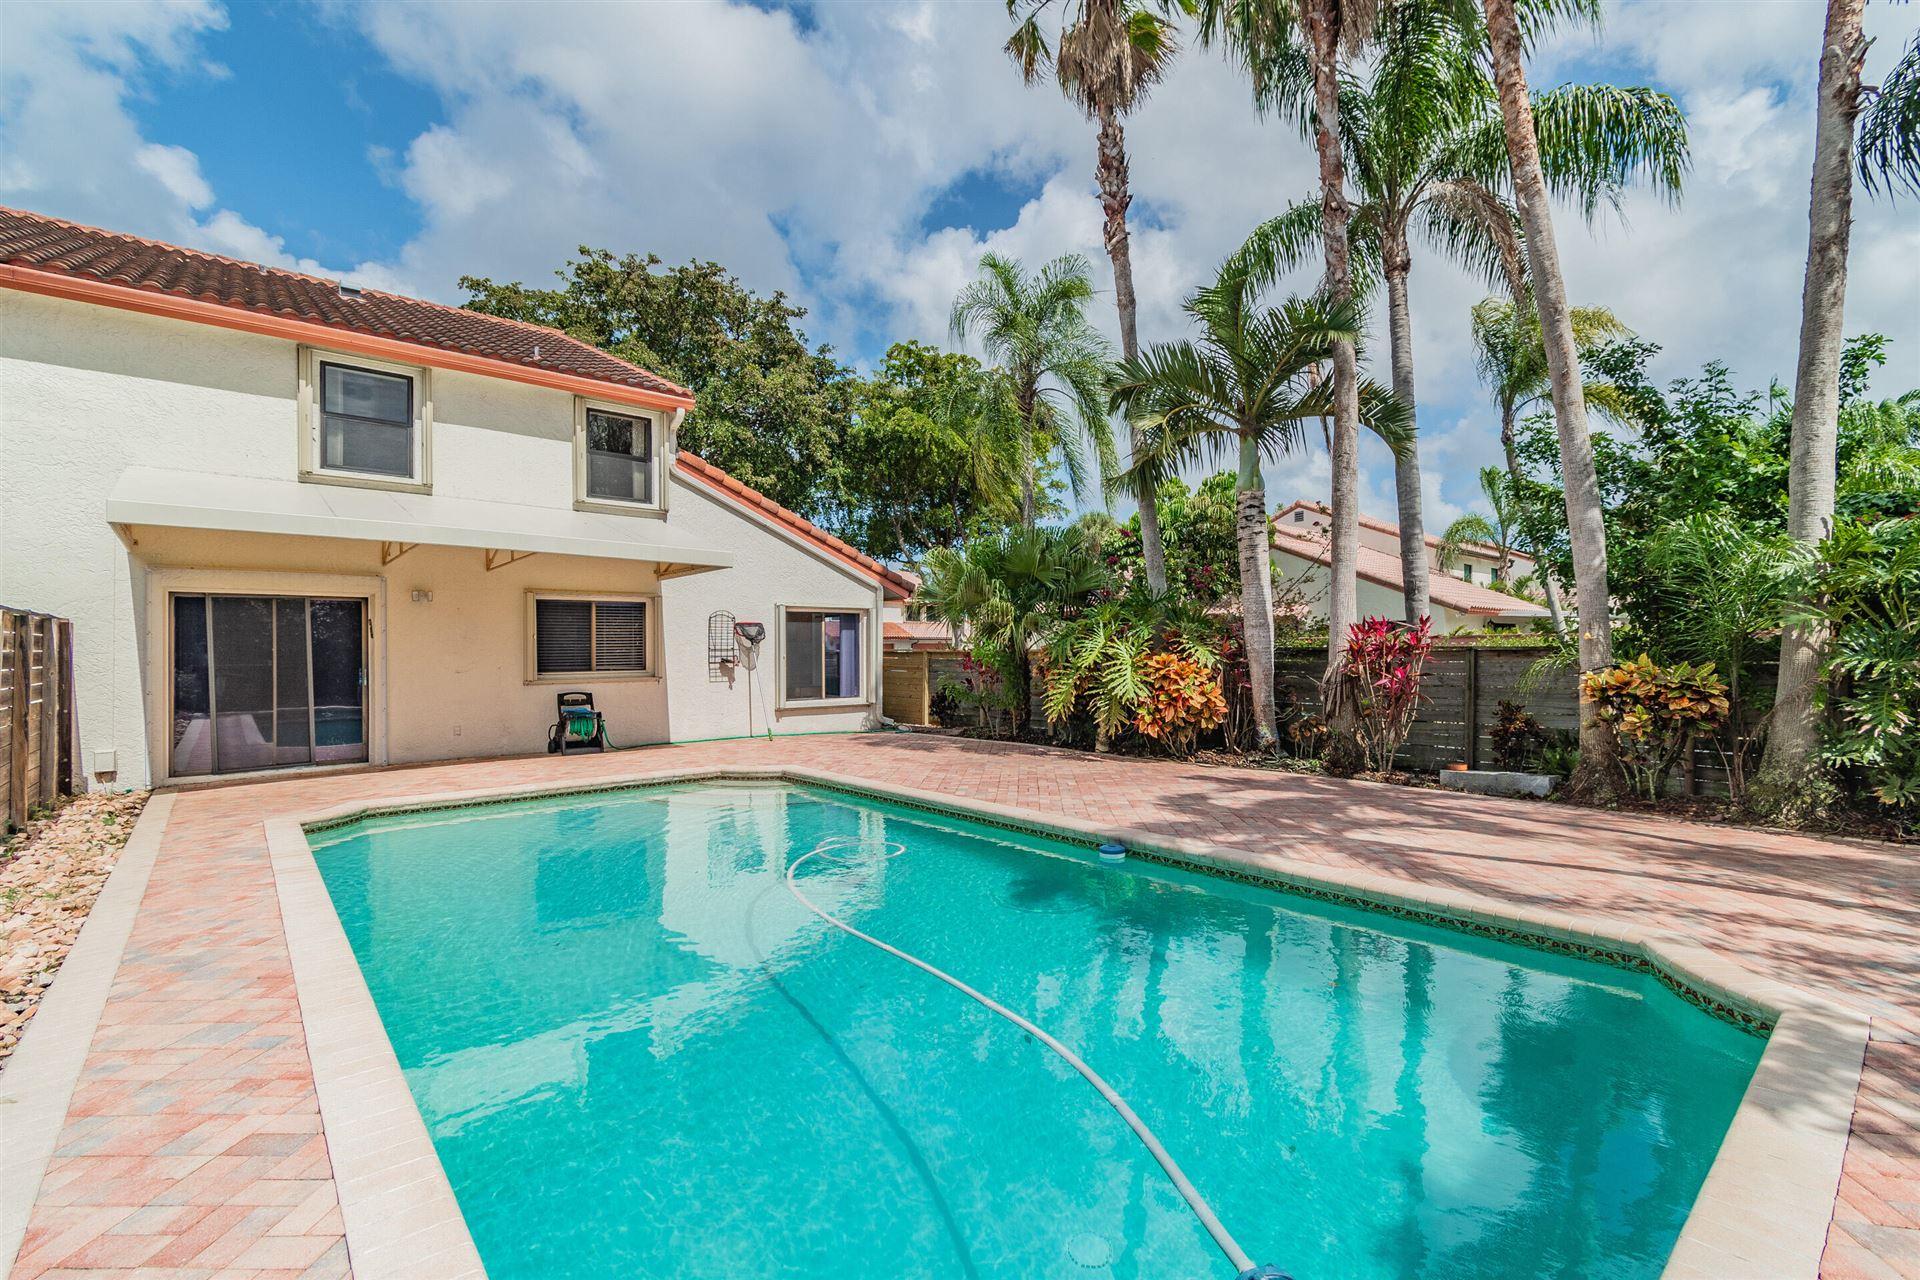 21621 Casa Monte Court, Boca Raton, FL 33433 - MLS#: RX-10719644